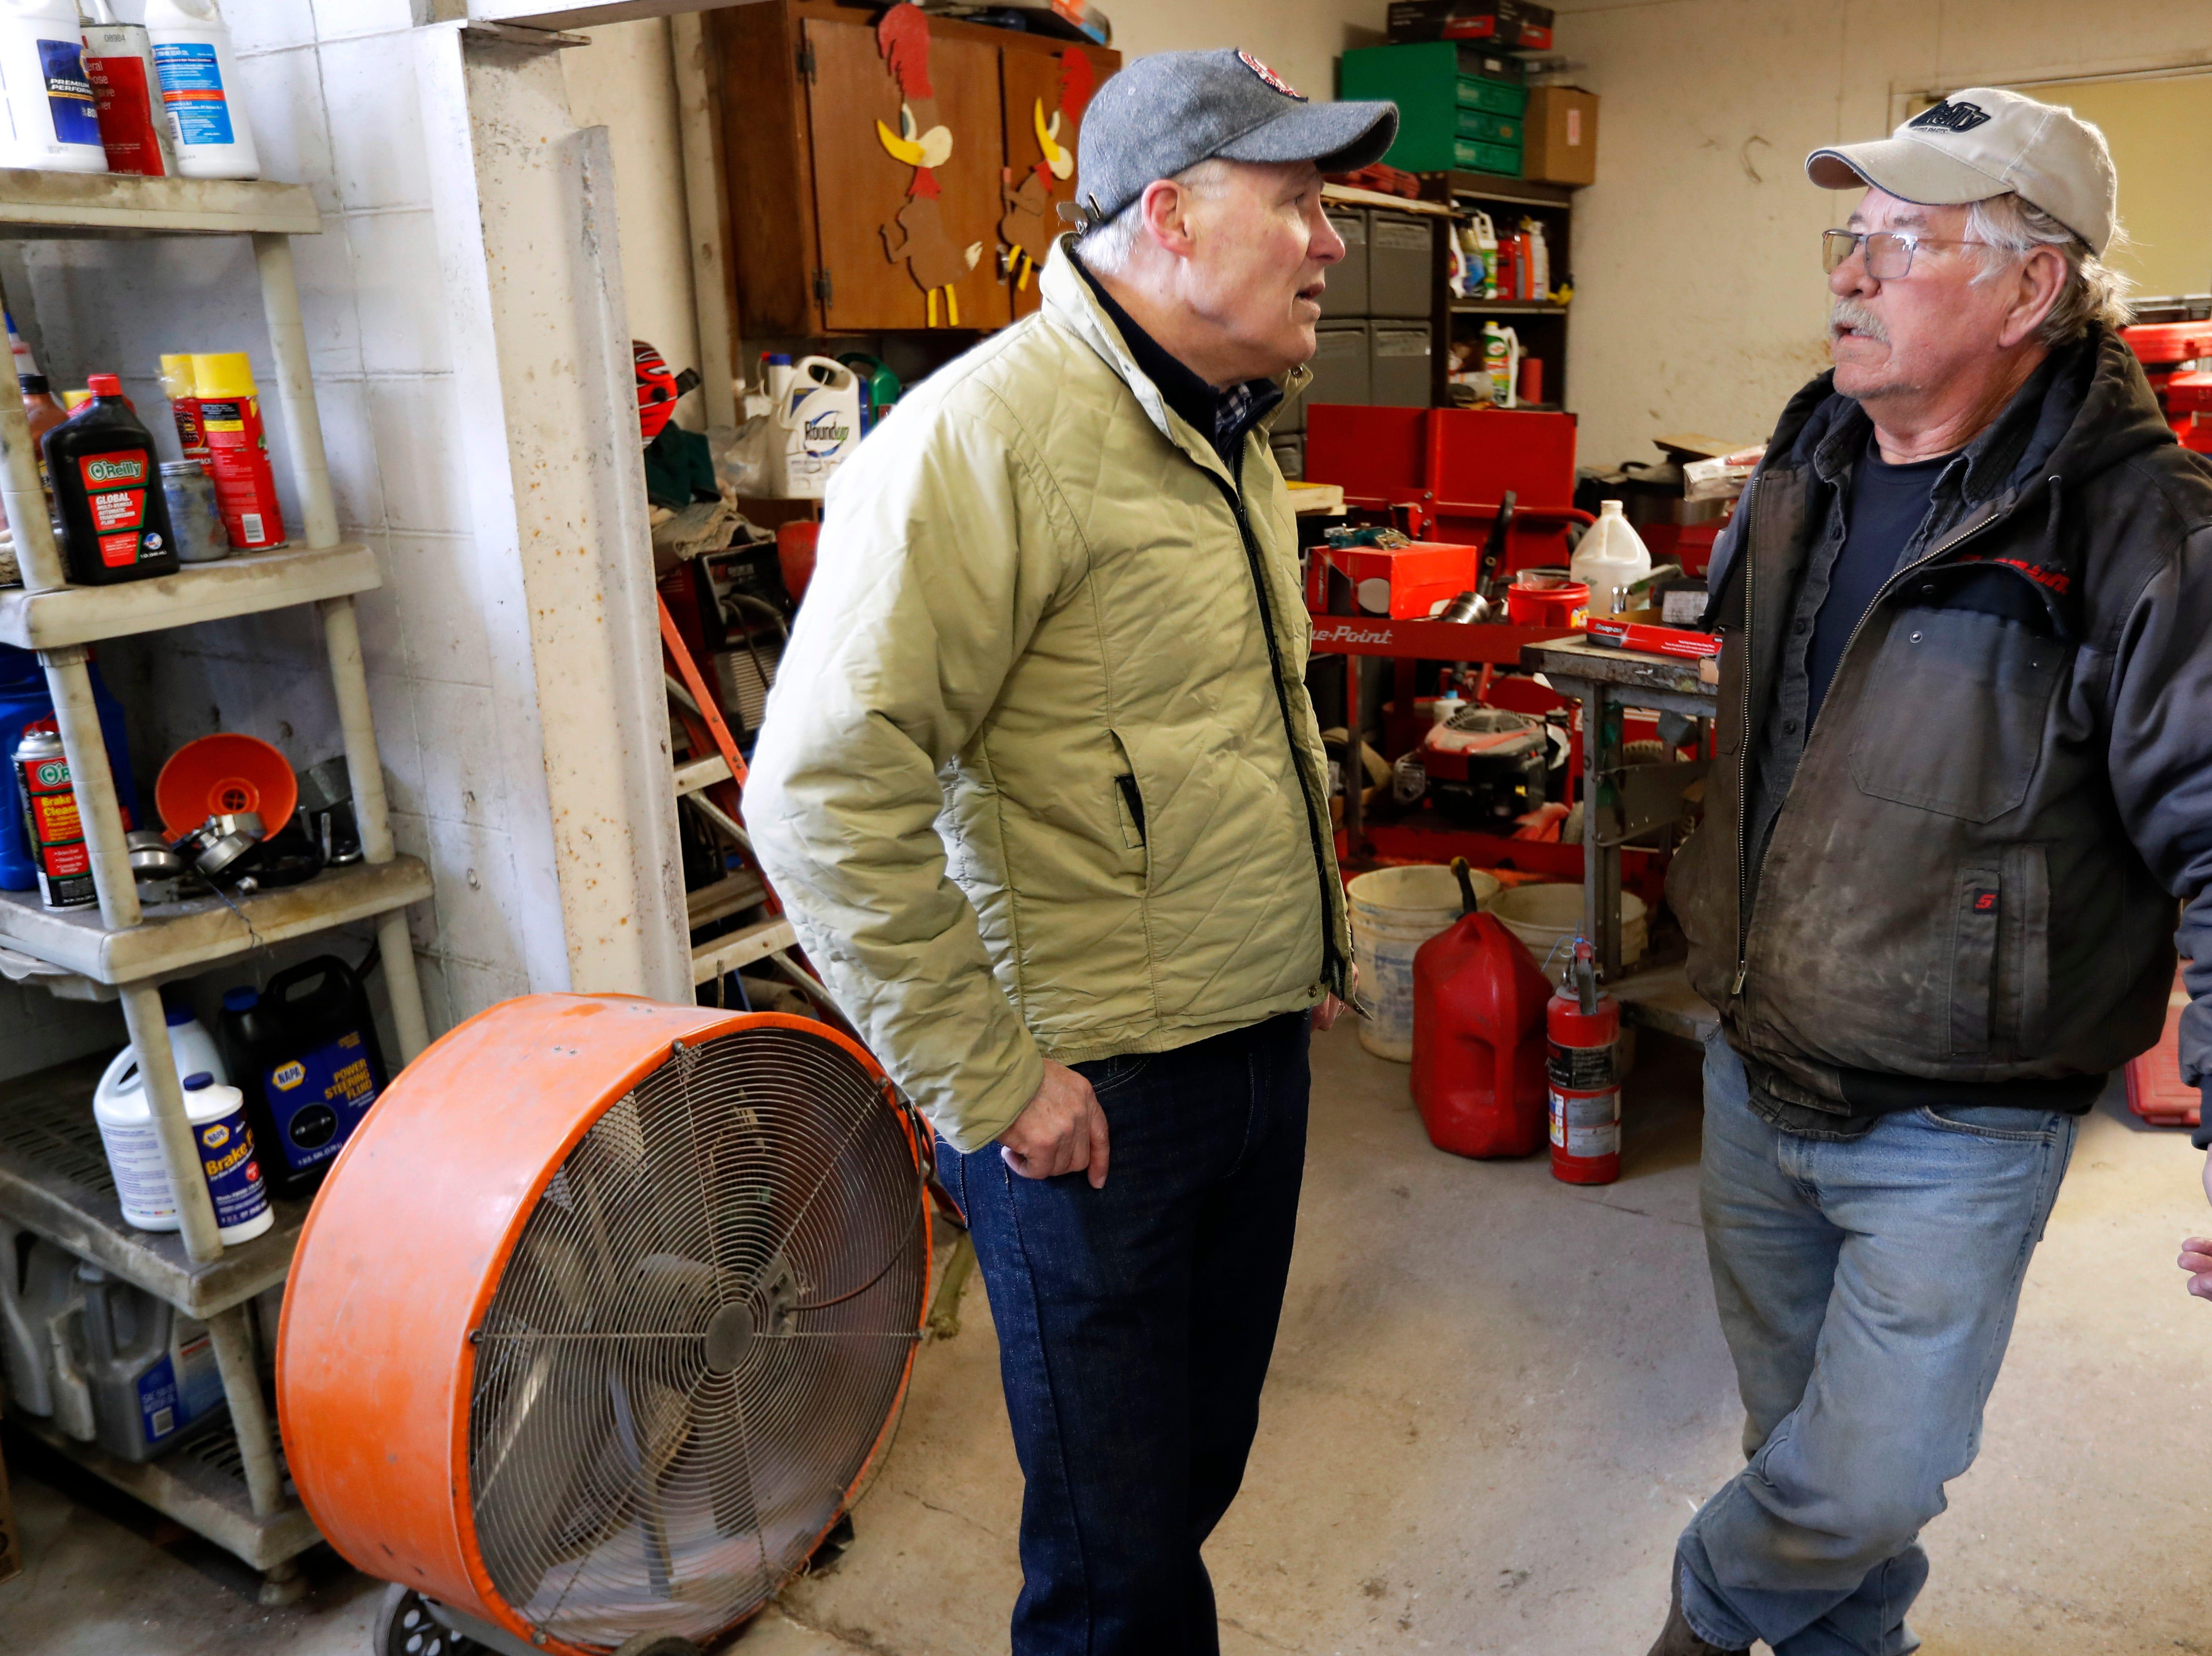 2020 Democratic presidential candidate Washington Gov. Jay Inslee talks with Ron Perry, of Hamburg, Iowa, right, while touring flood damage, Friday, April 12, 2019, in Hamburg, Iowa.